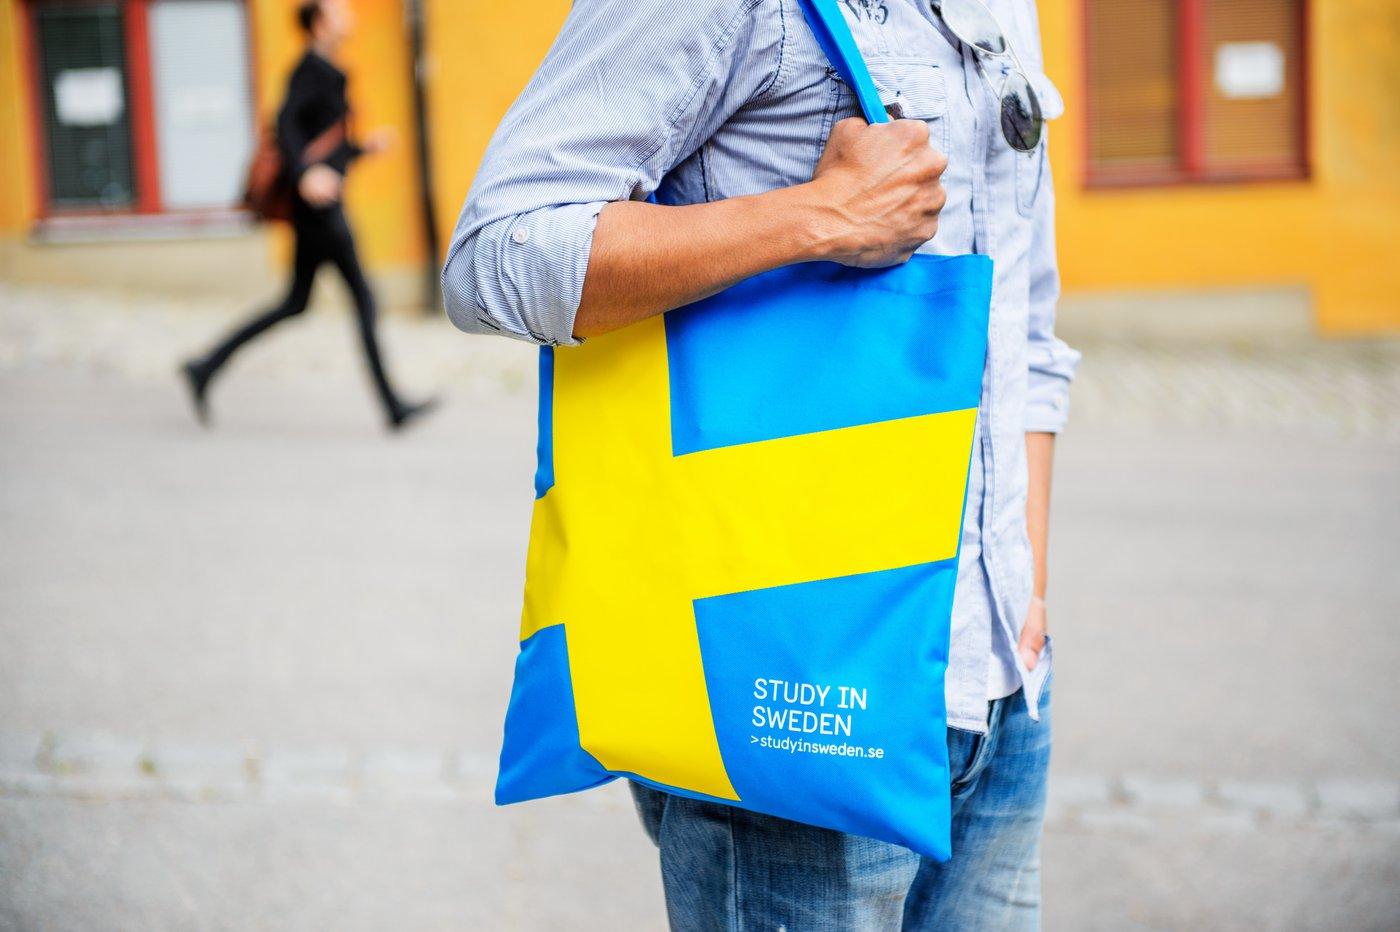 Simon Paulin/imagebank.sweden.se